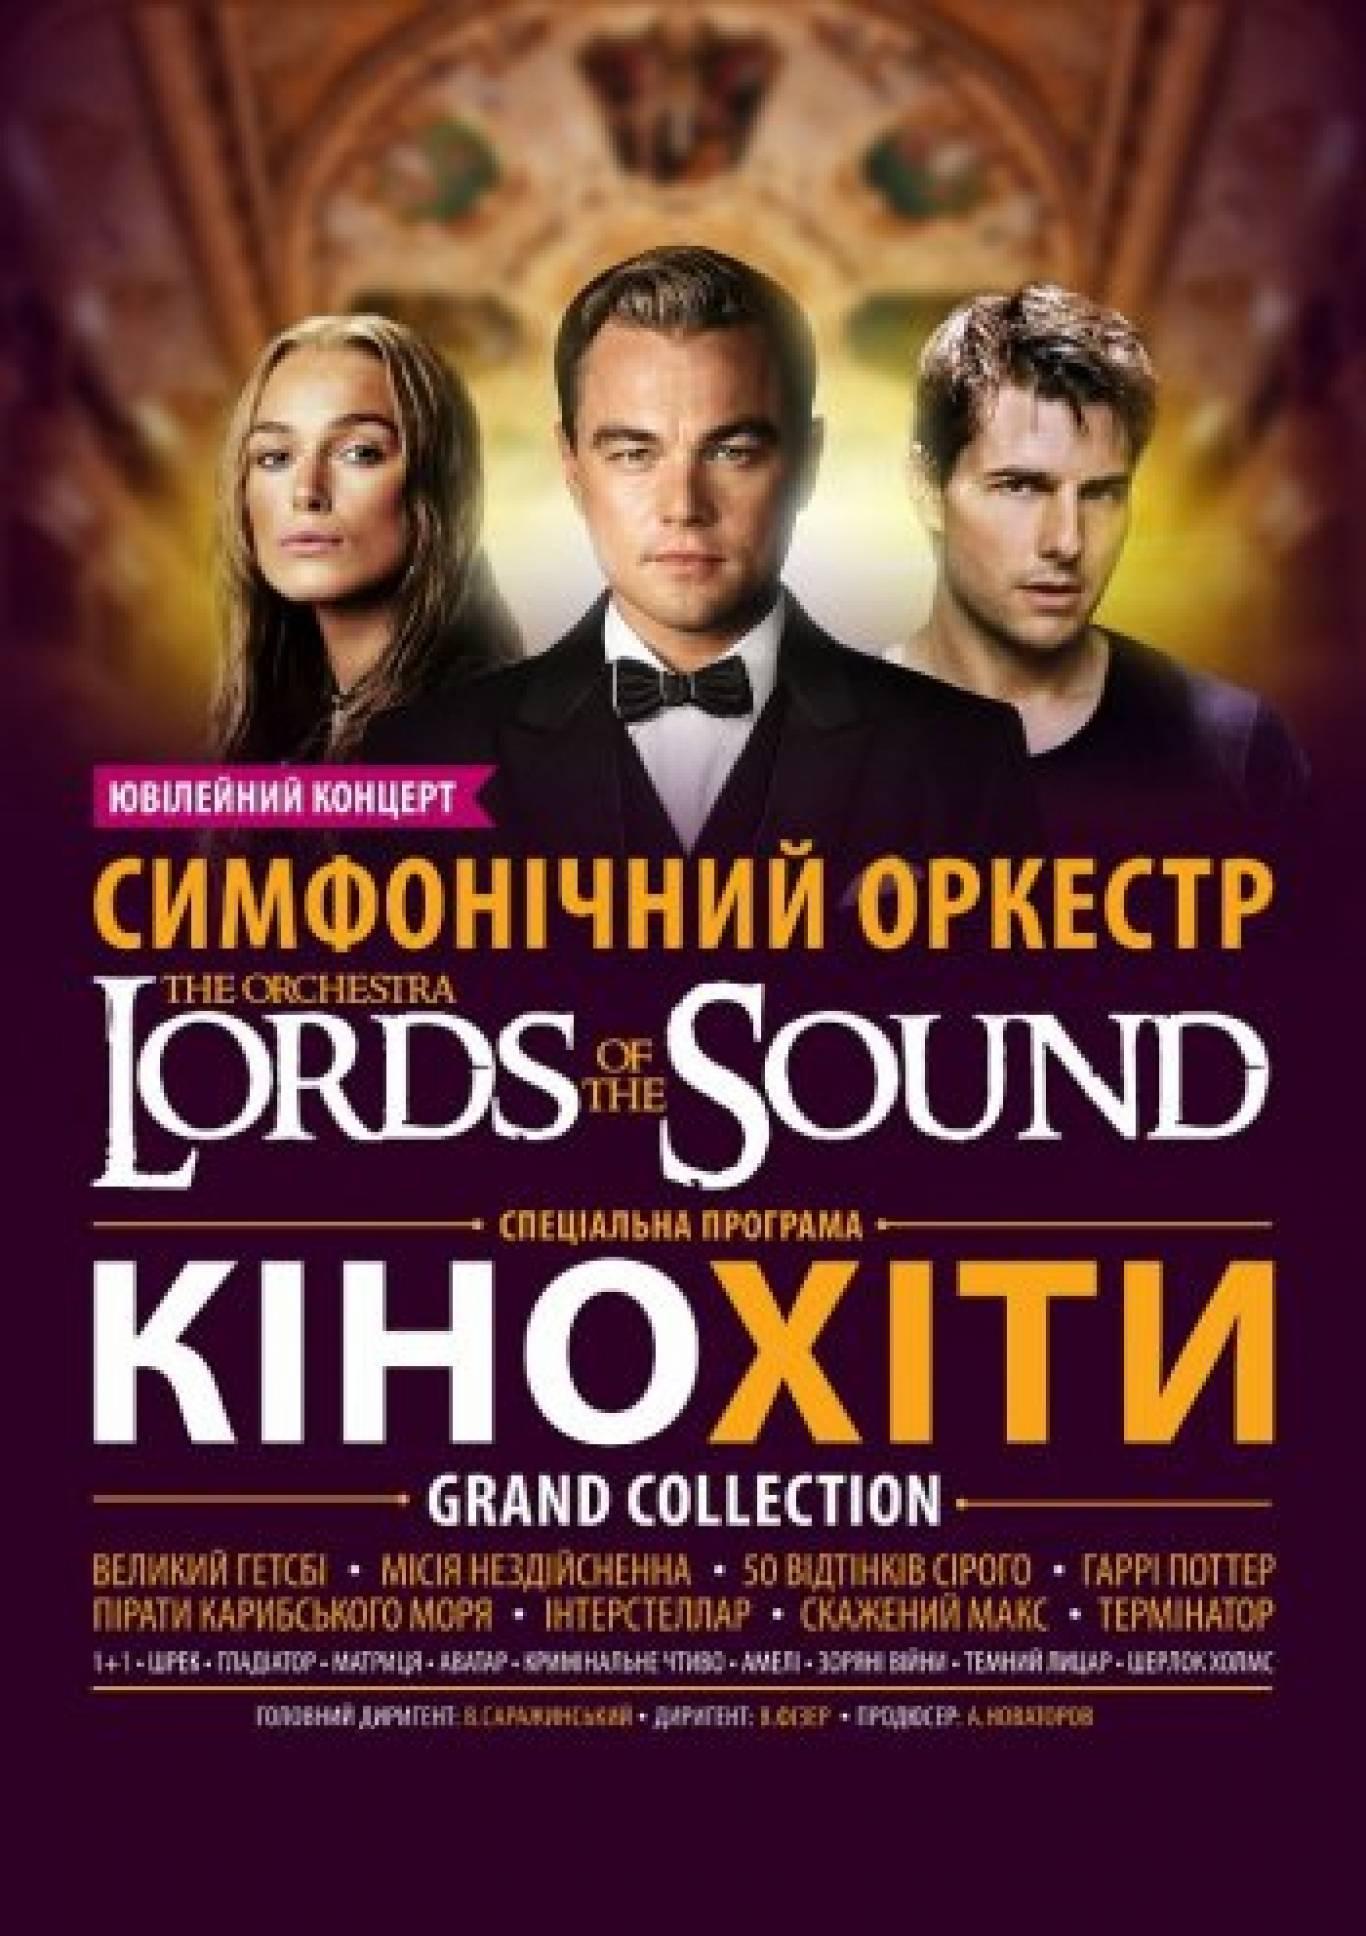 Симфонічний оркестр LORDS OF THE SOUNDS